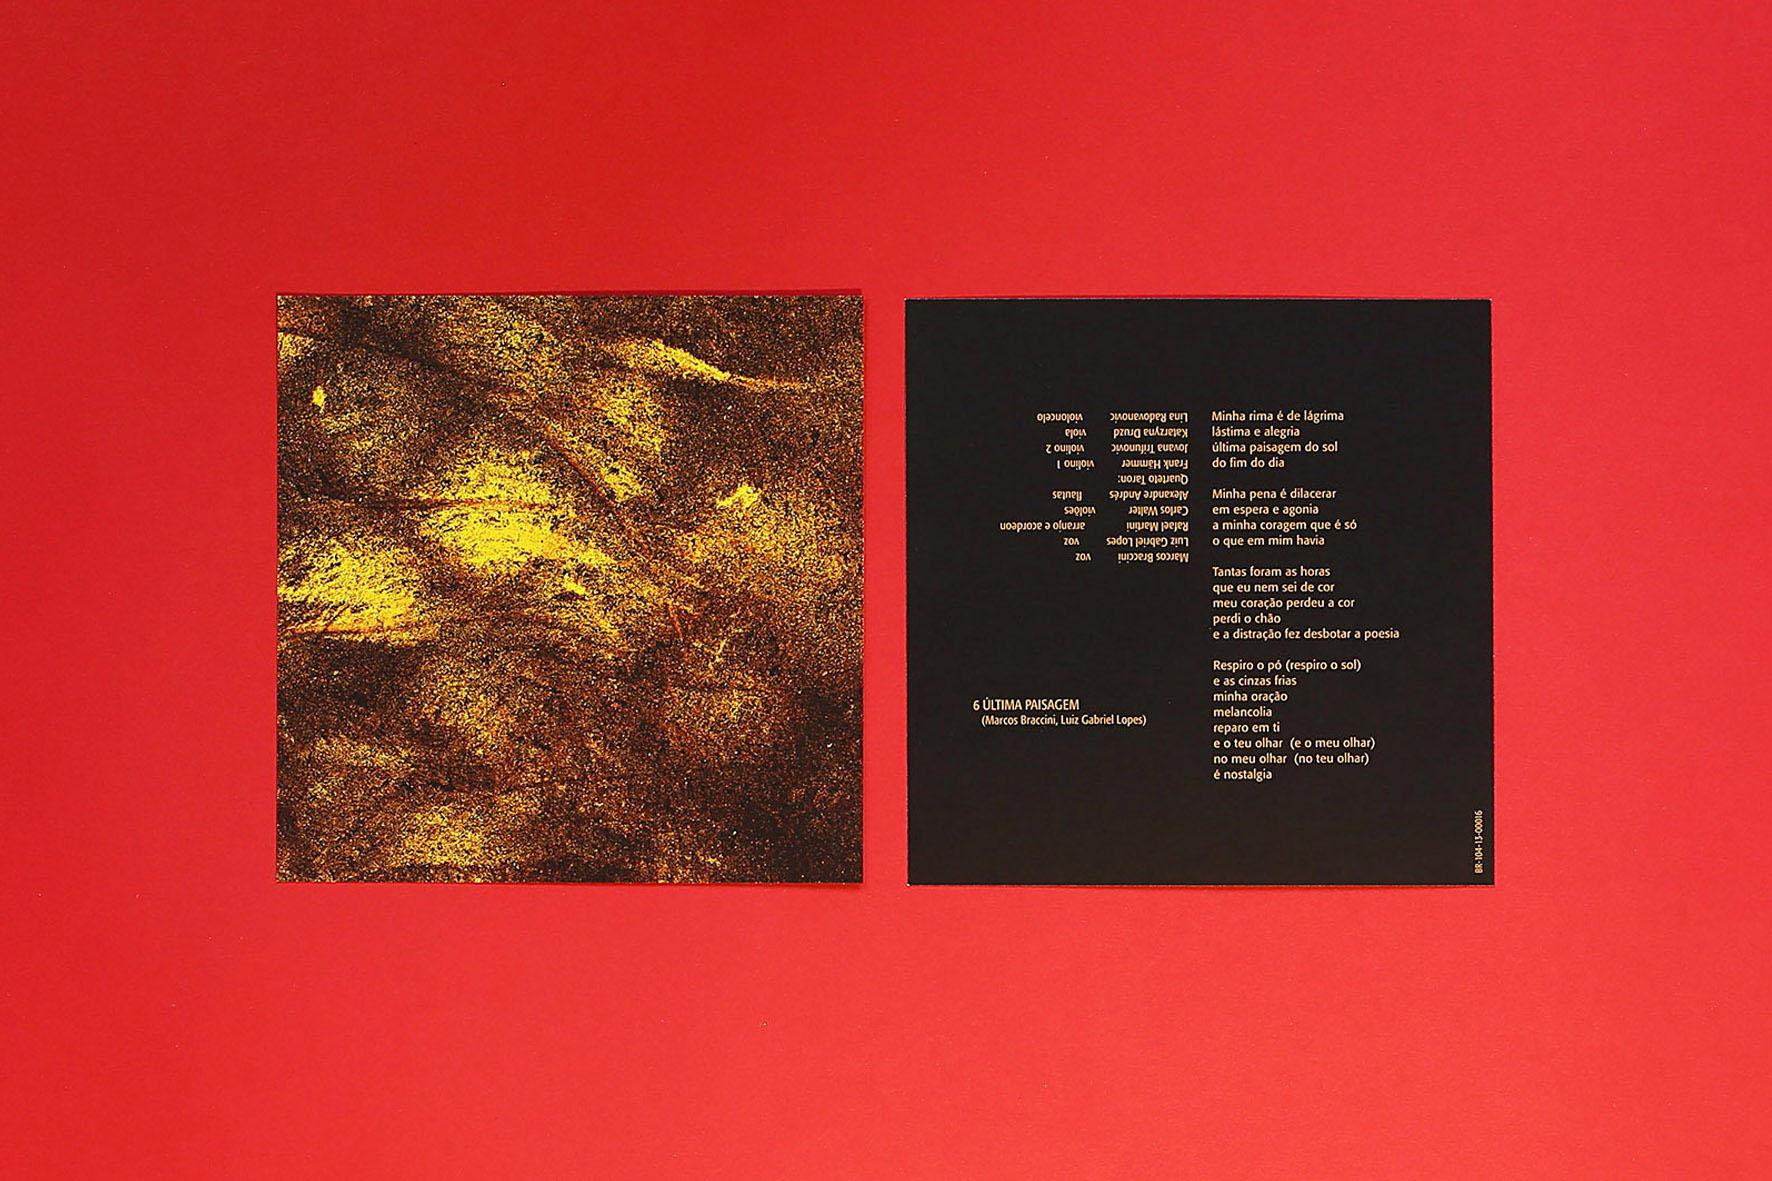 Noturno-Daniel-Cavalcanti-ficha-4